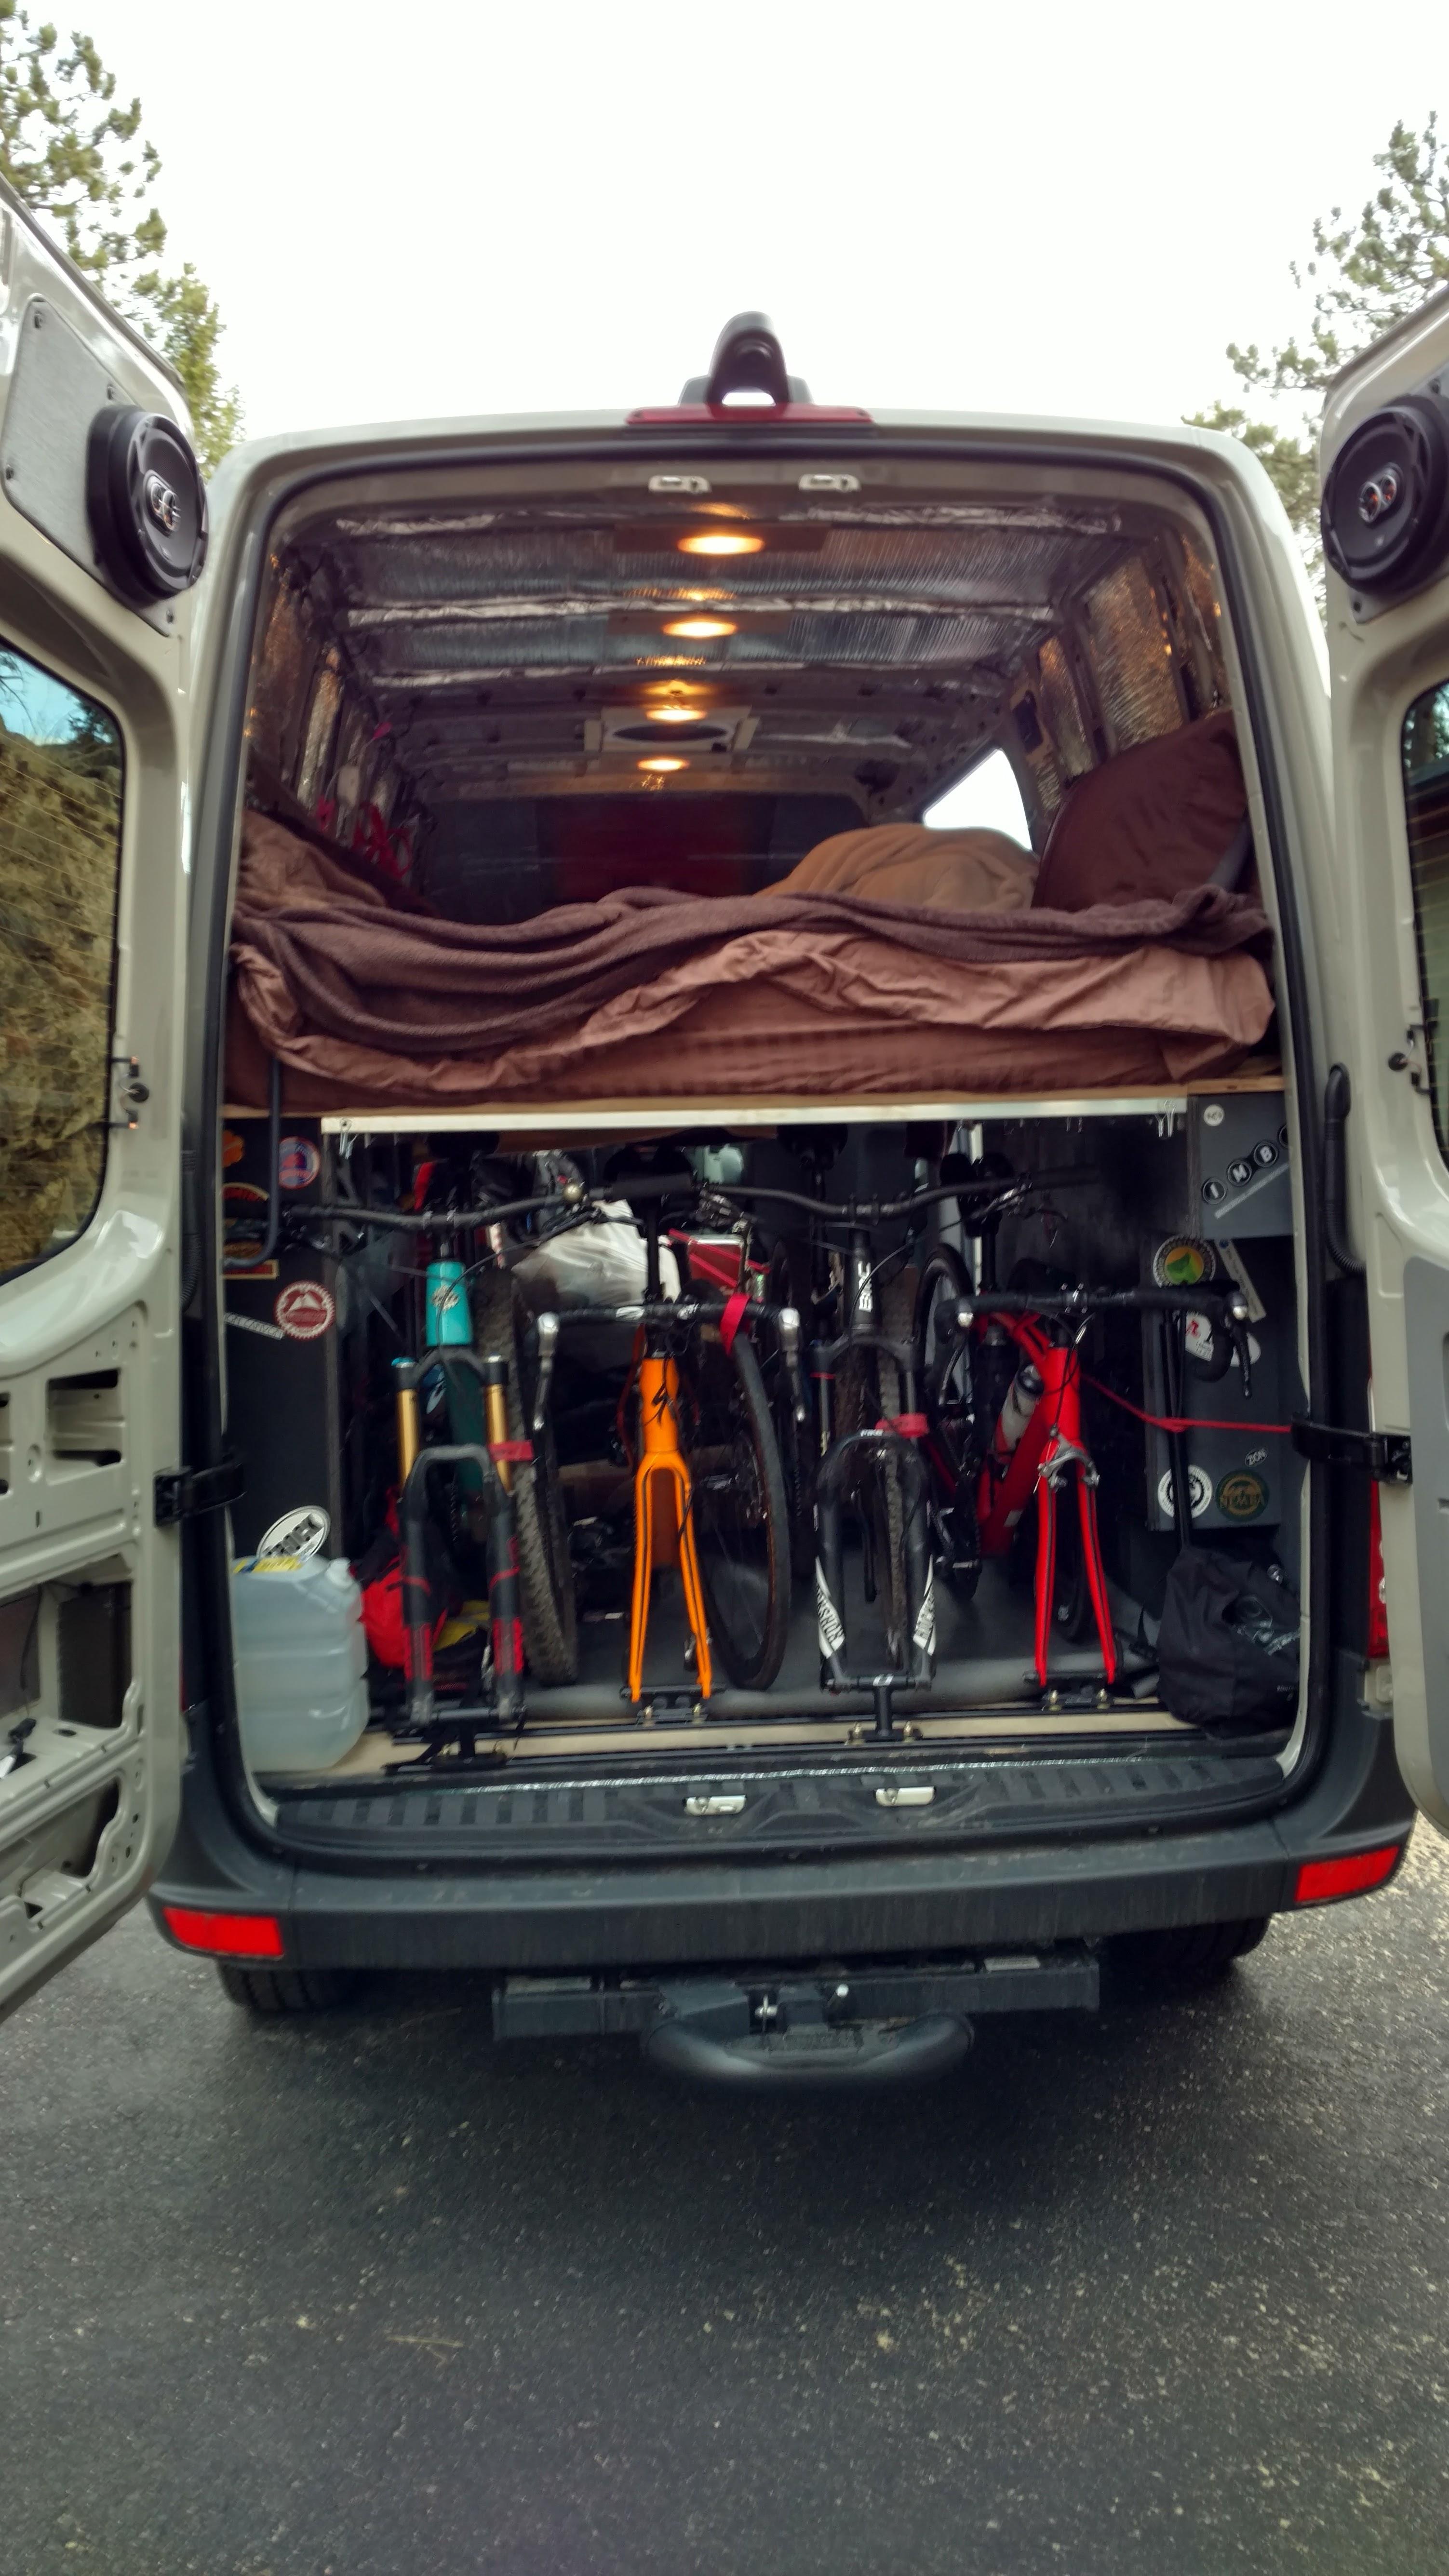 Diy Sprinter Van Bike Mounts Ridingroadsandtrails